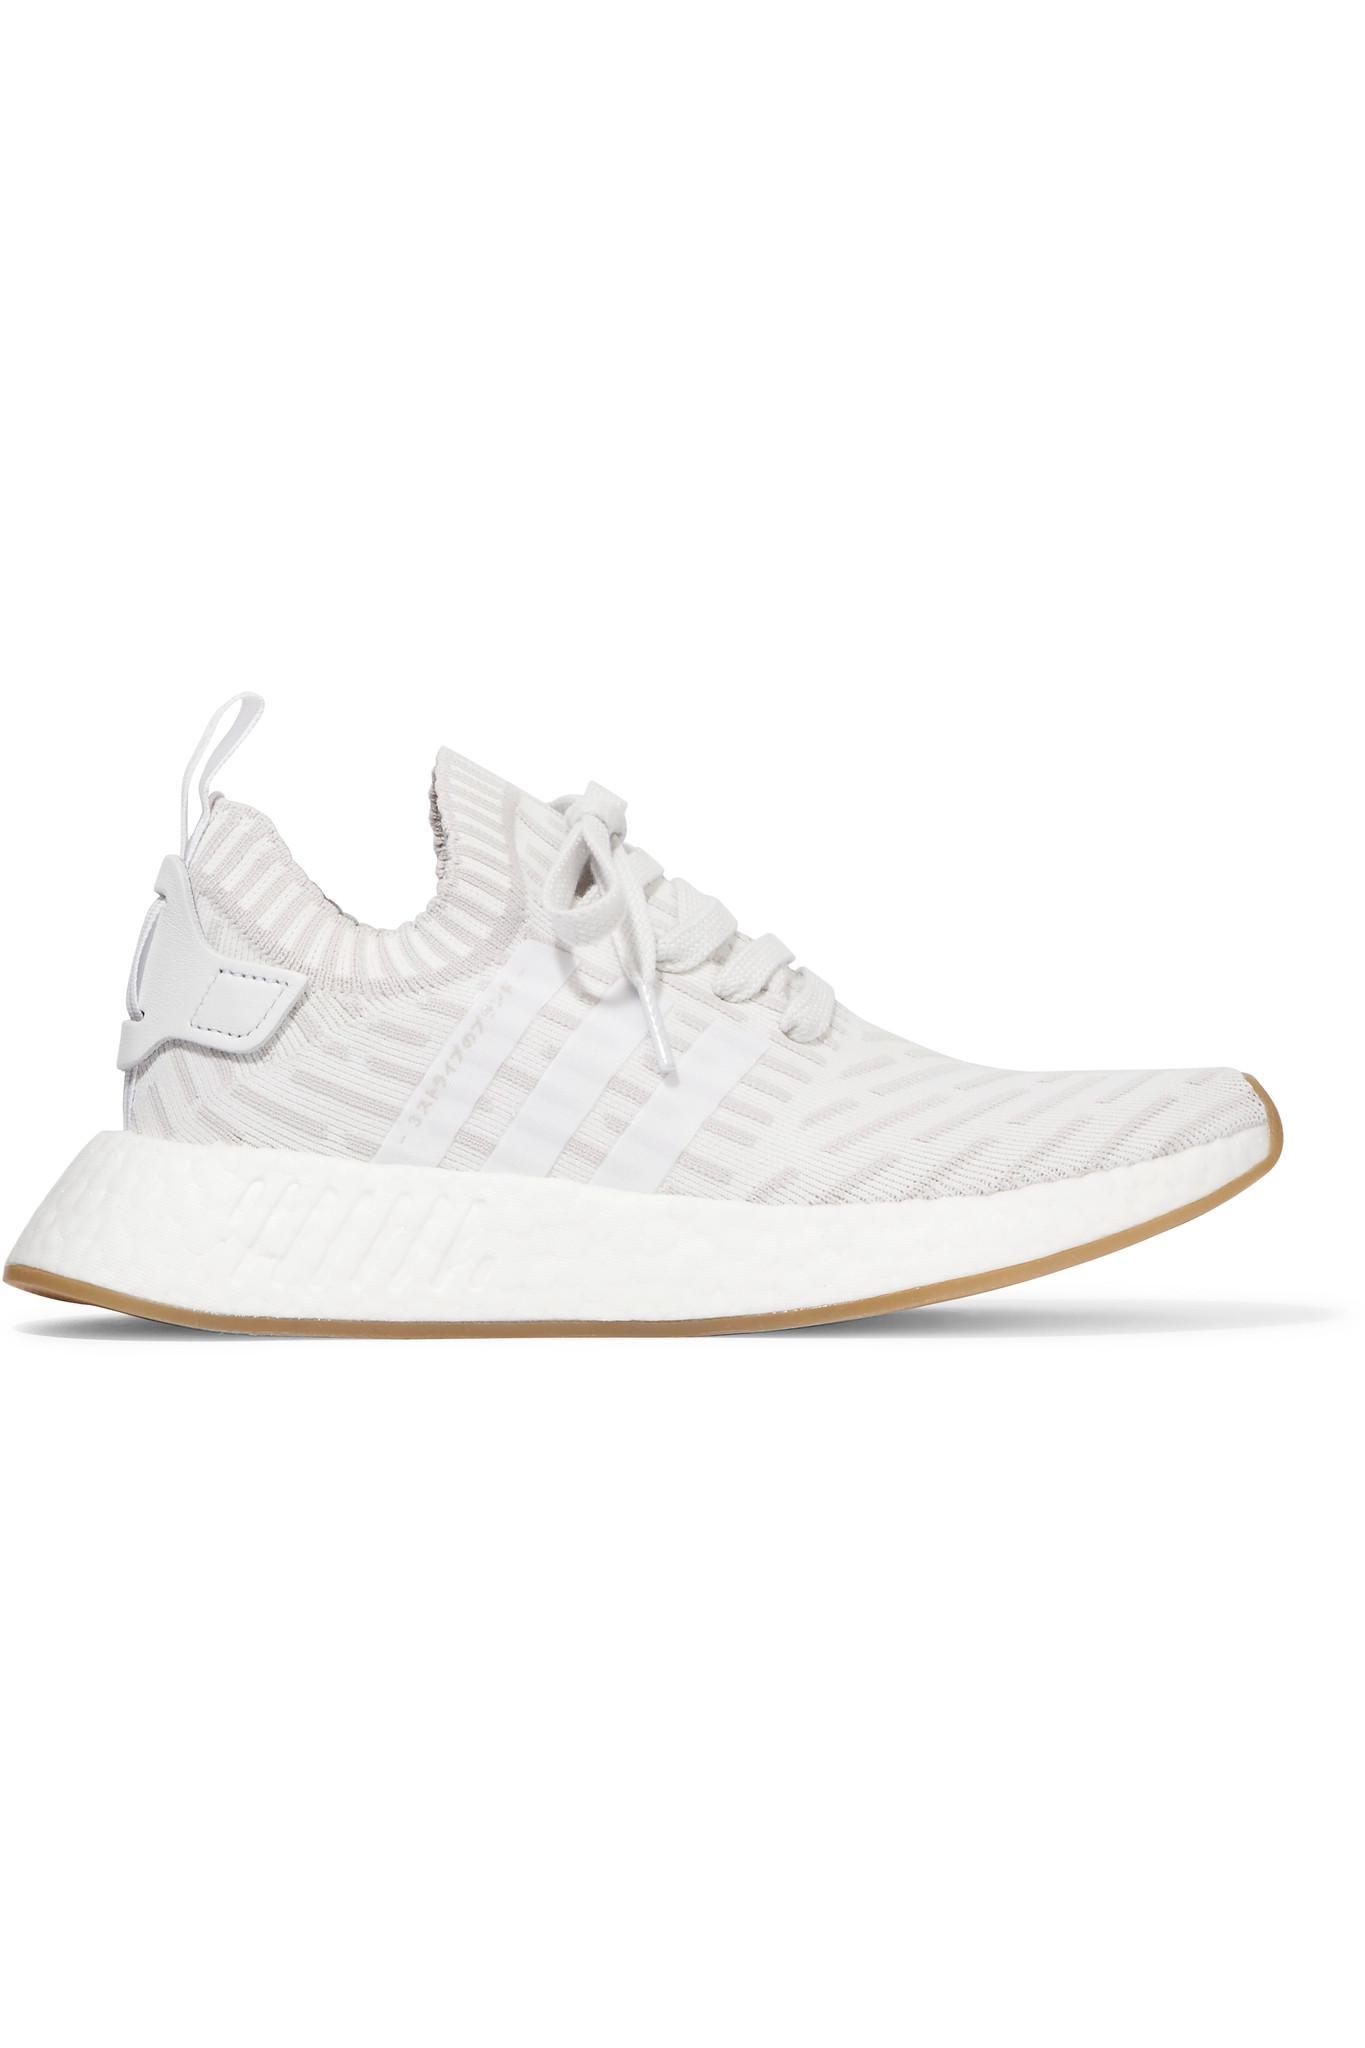 Nmd Baskets Primeknit R2 Garnis De Cuir - Blanc Adidas Originals tiWlTG5